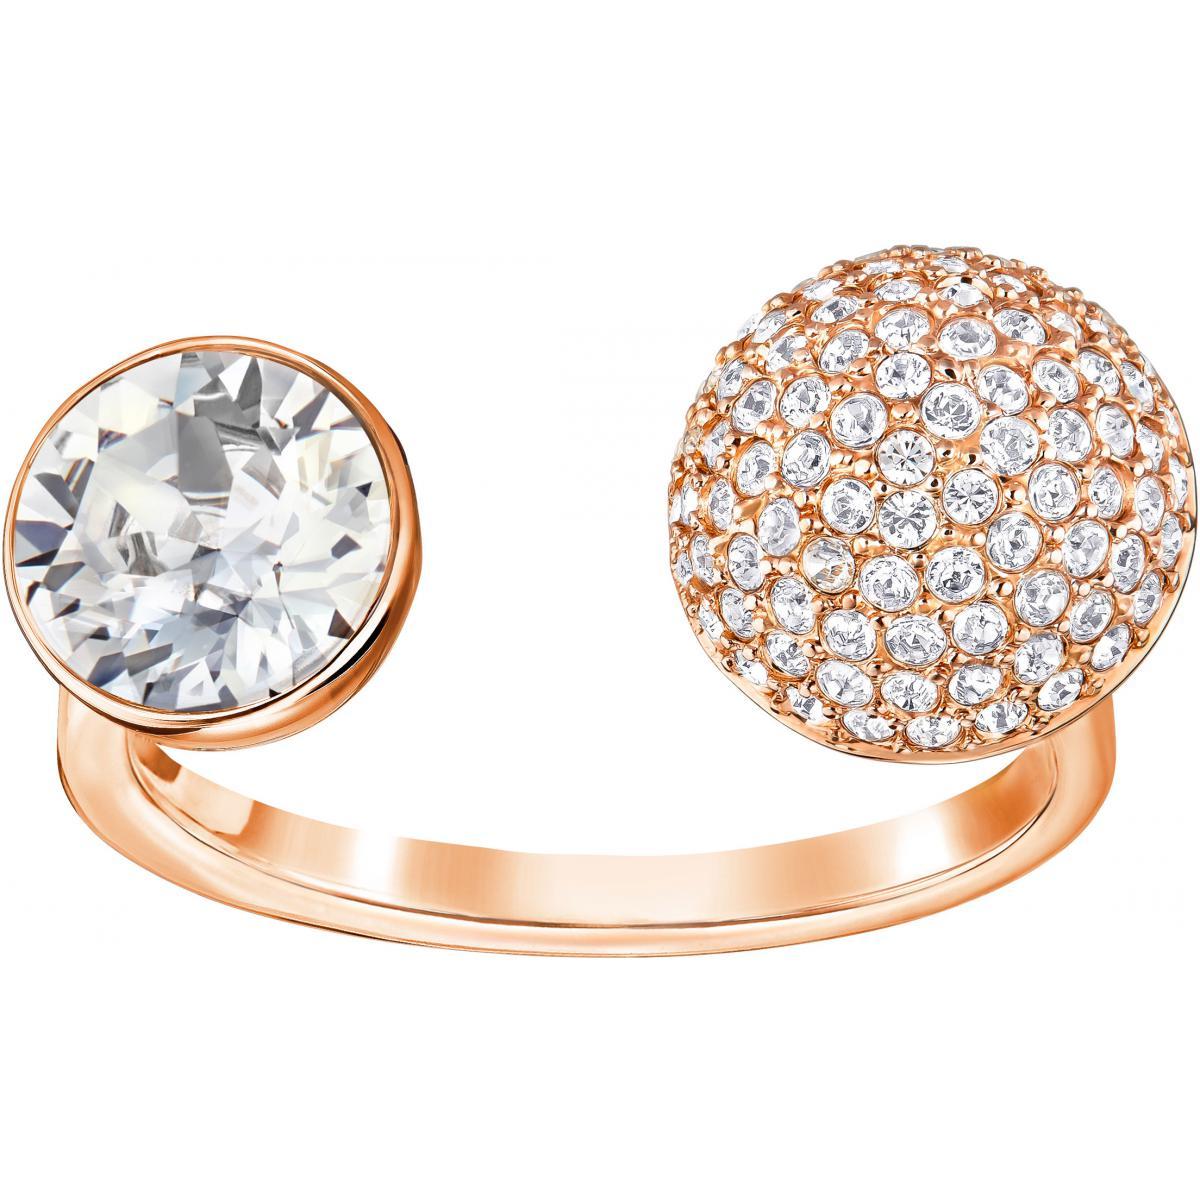 Bague Swarovski Modern Jewelry FORWARD-OP-CRY - Bague Or Blanc Femme